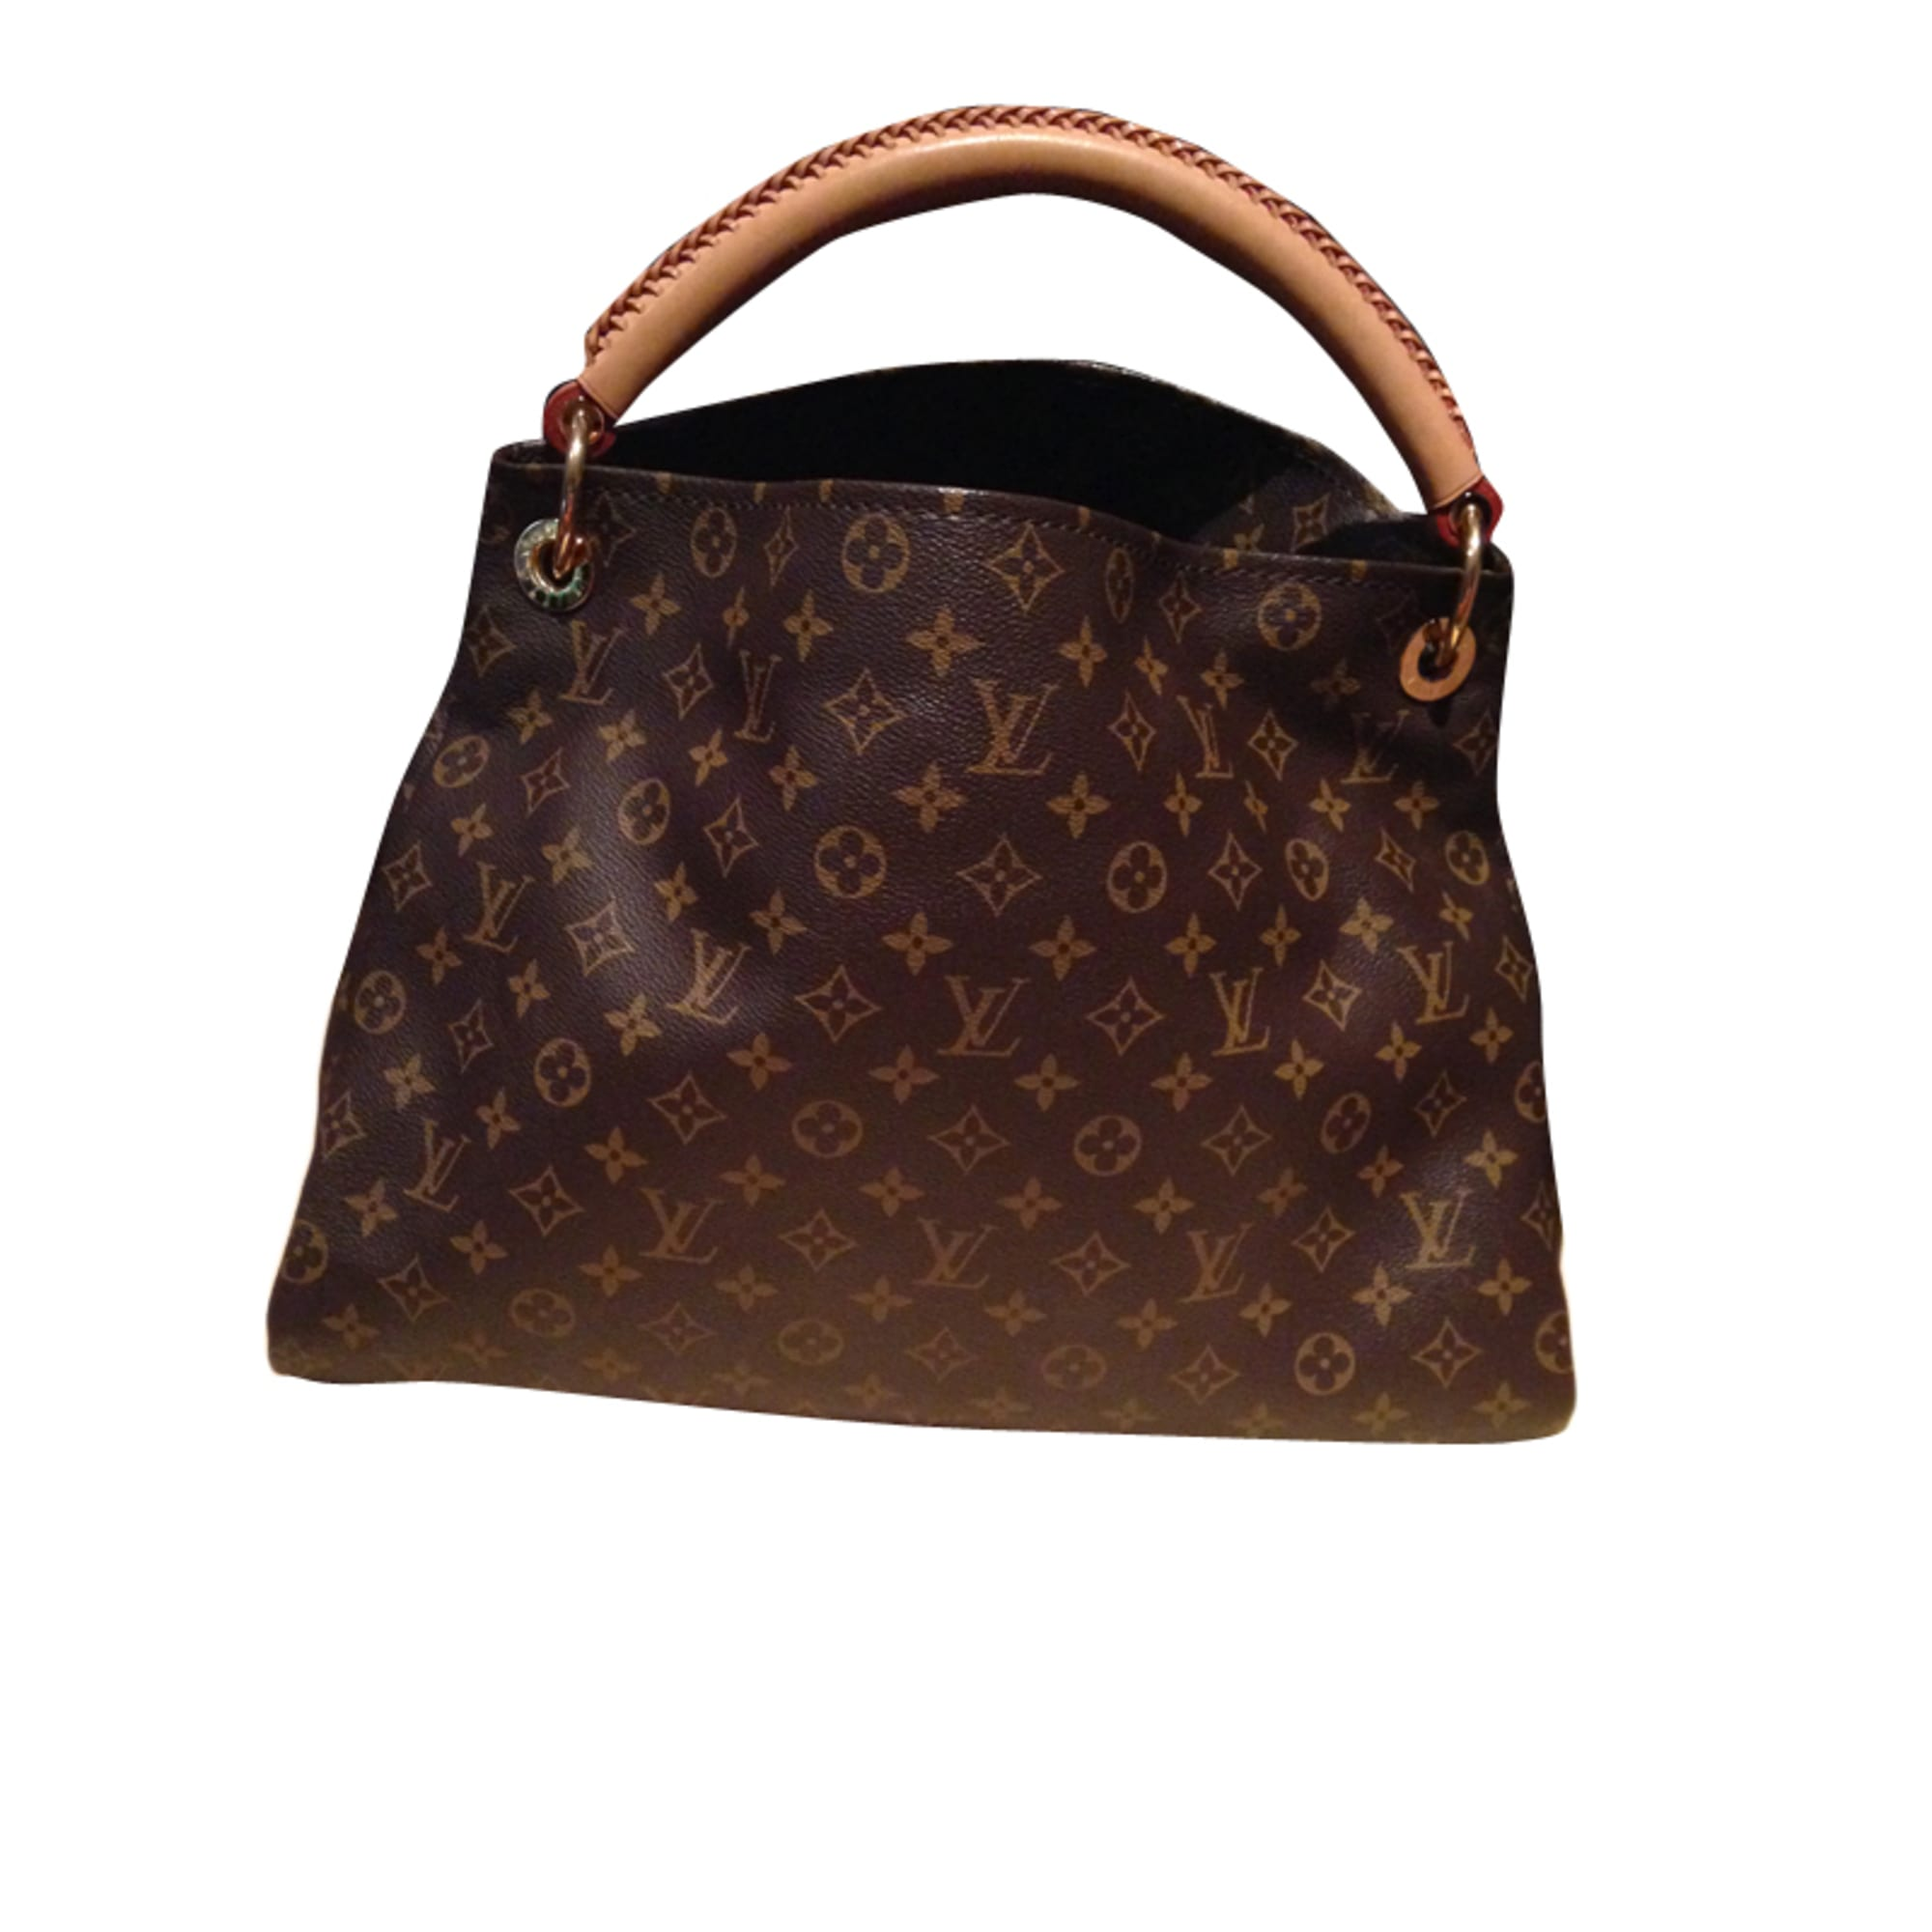 b05f058ba30c Sac à main en cuir LOUIS VUITTON artsy marron vendu par Dora84 - 3574679